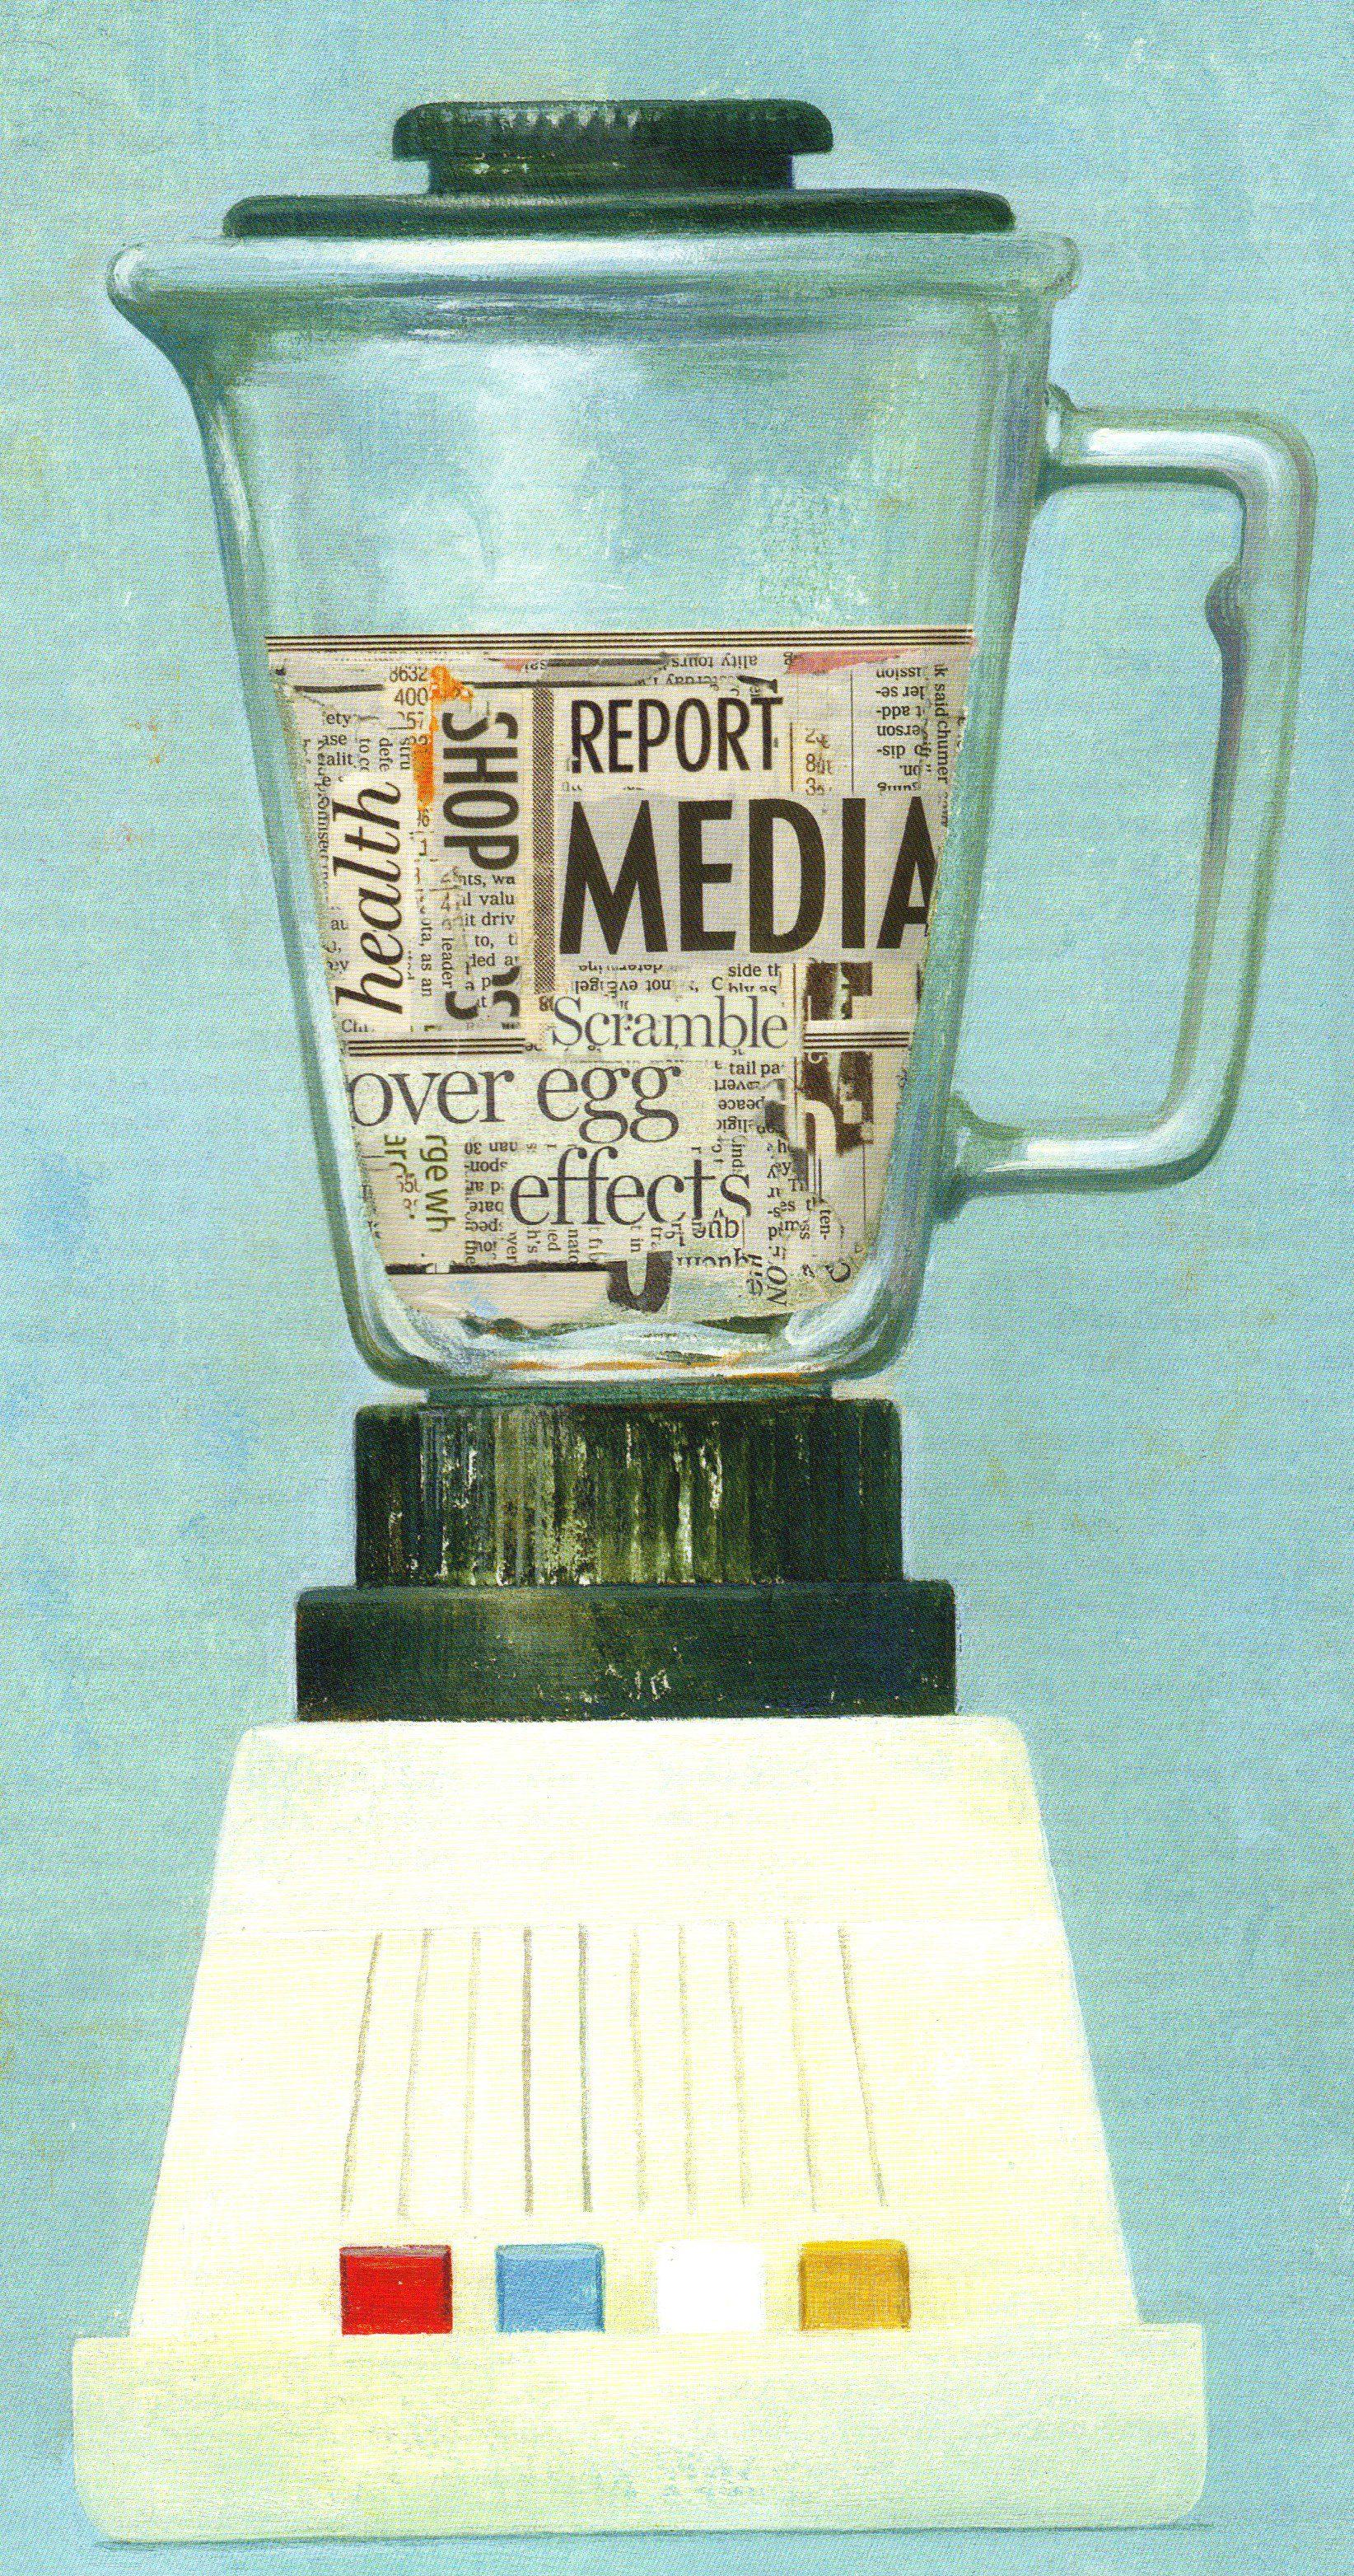 Newspaper in blender